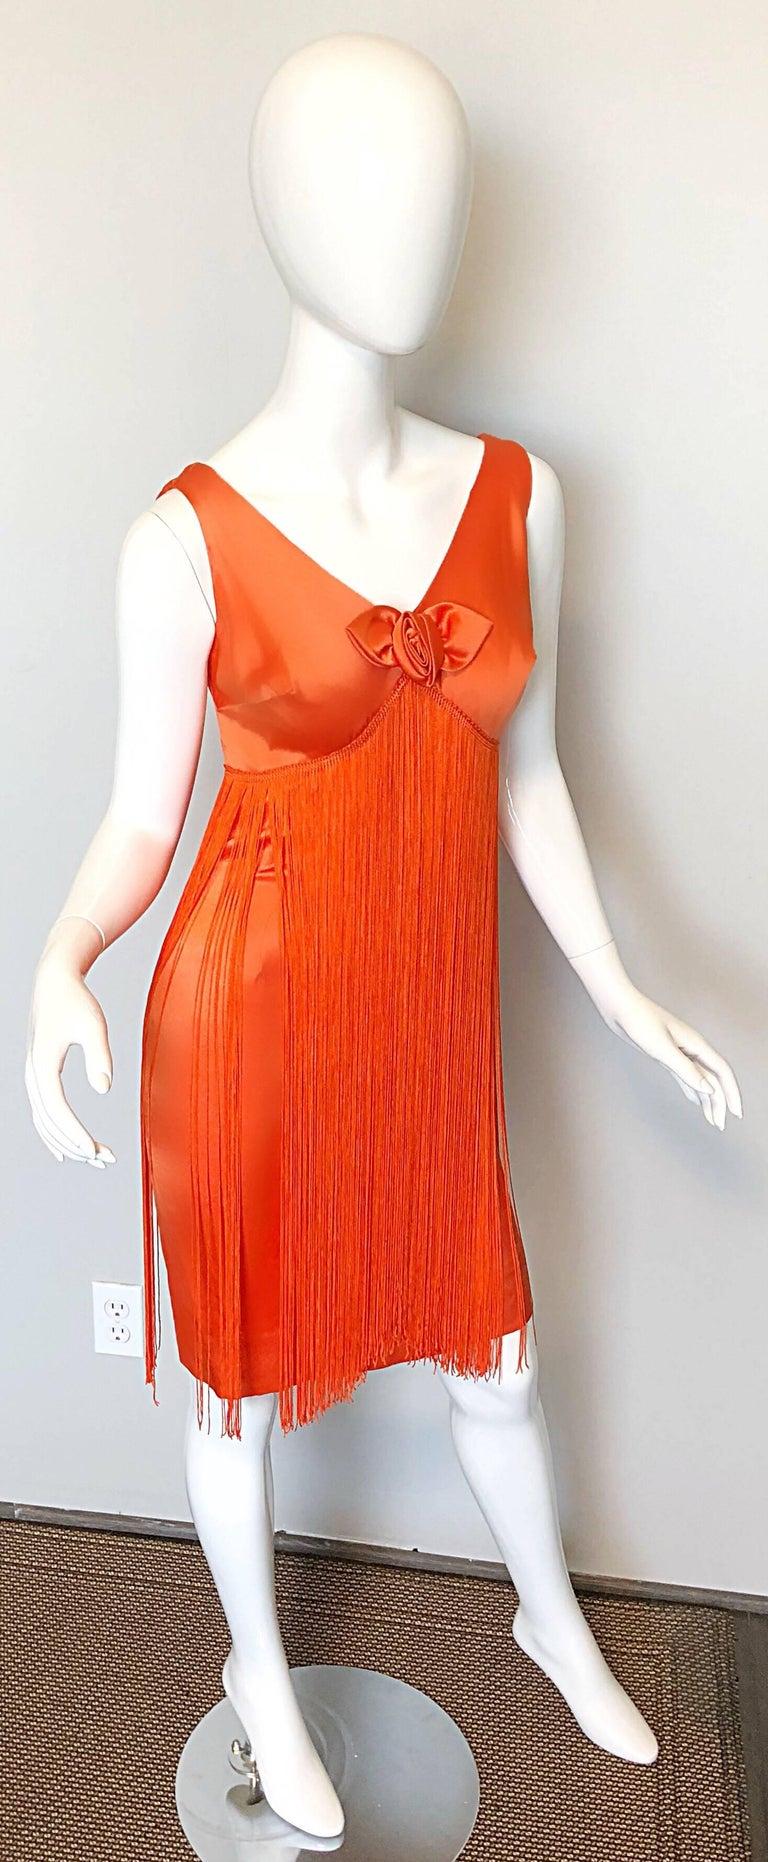 Joseph Magnin 1960s Amazing Bright Orange Fully Fringe Flapper Jersey 60s Dress For Sale 3